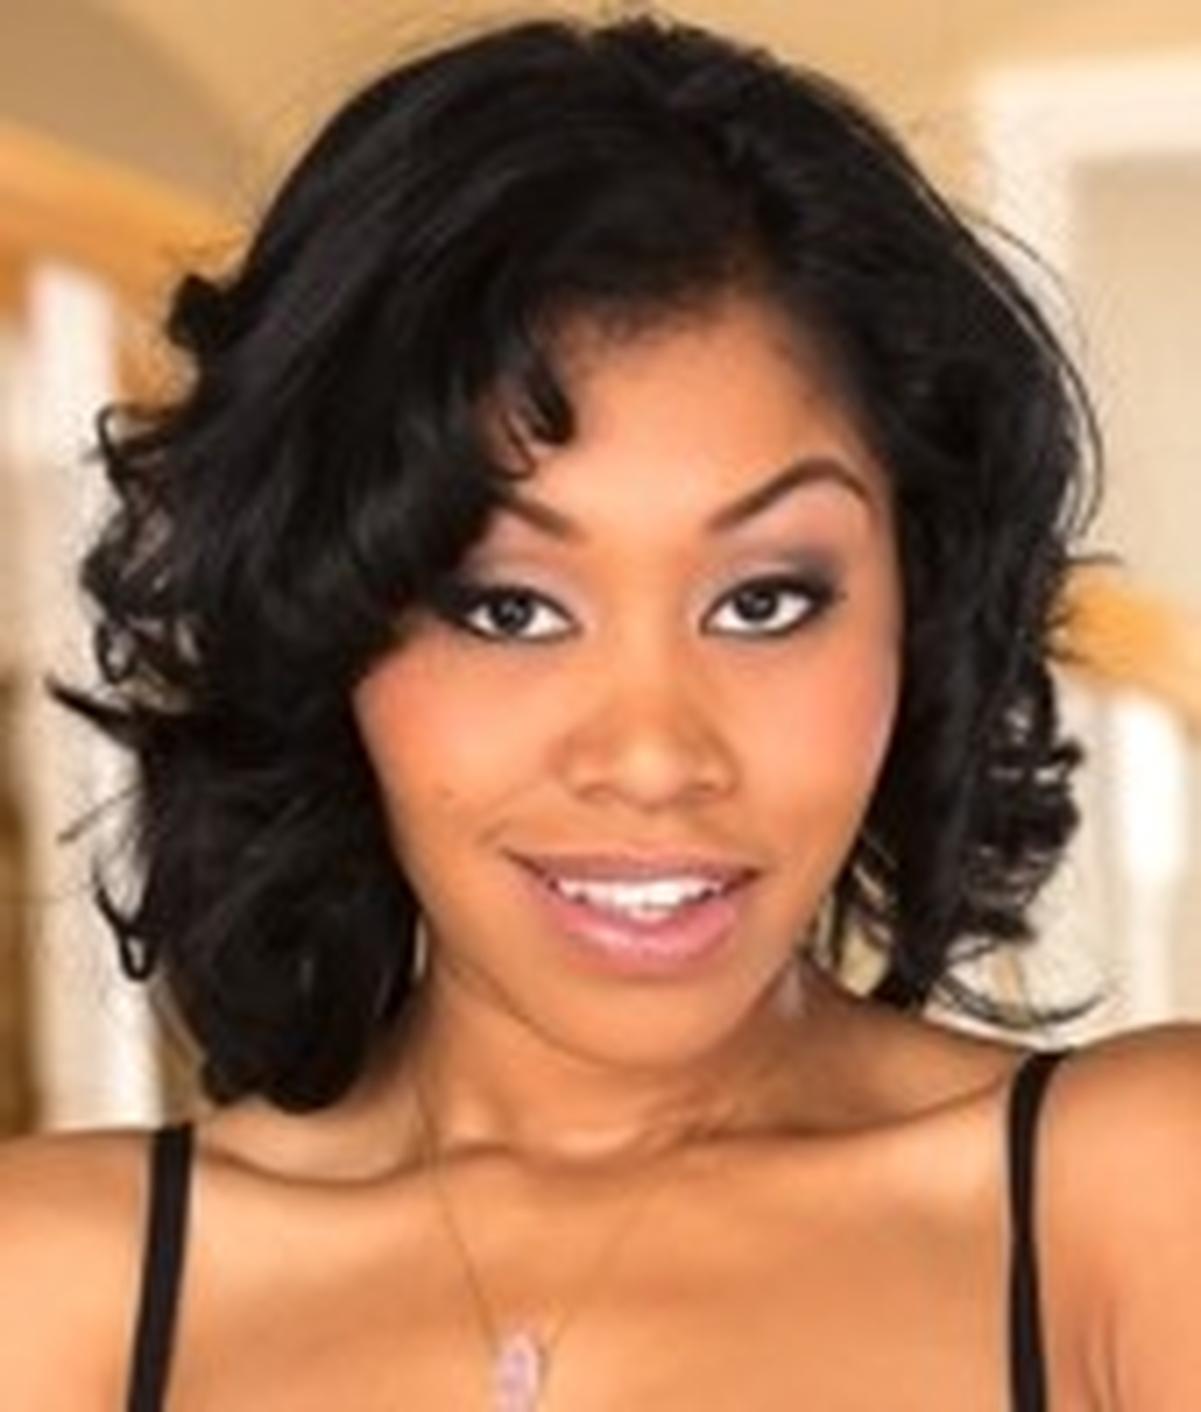 Yasmine de Leon   Wiki & Bio   Everipedia